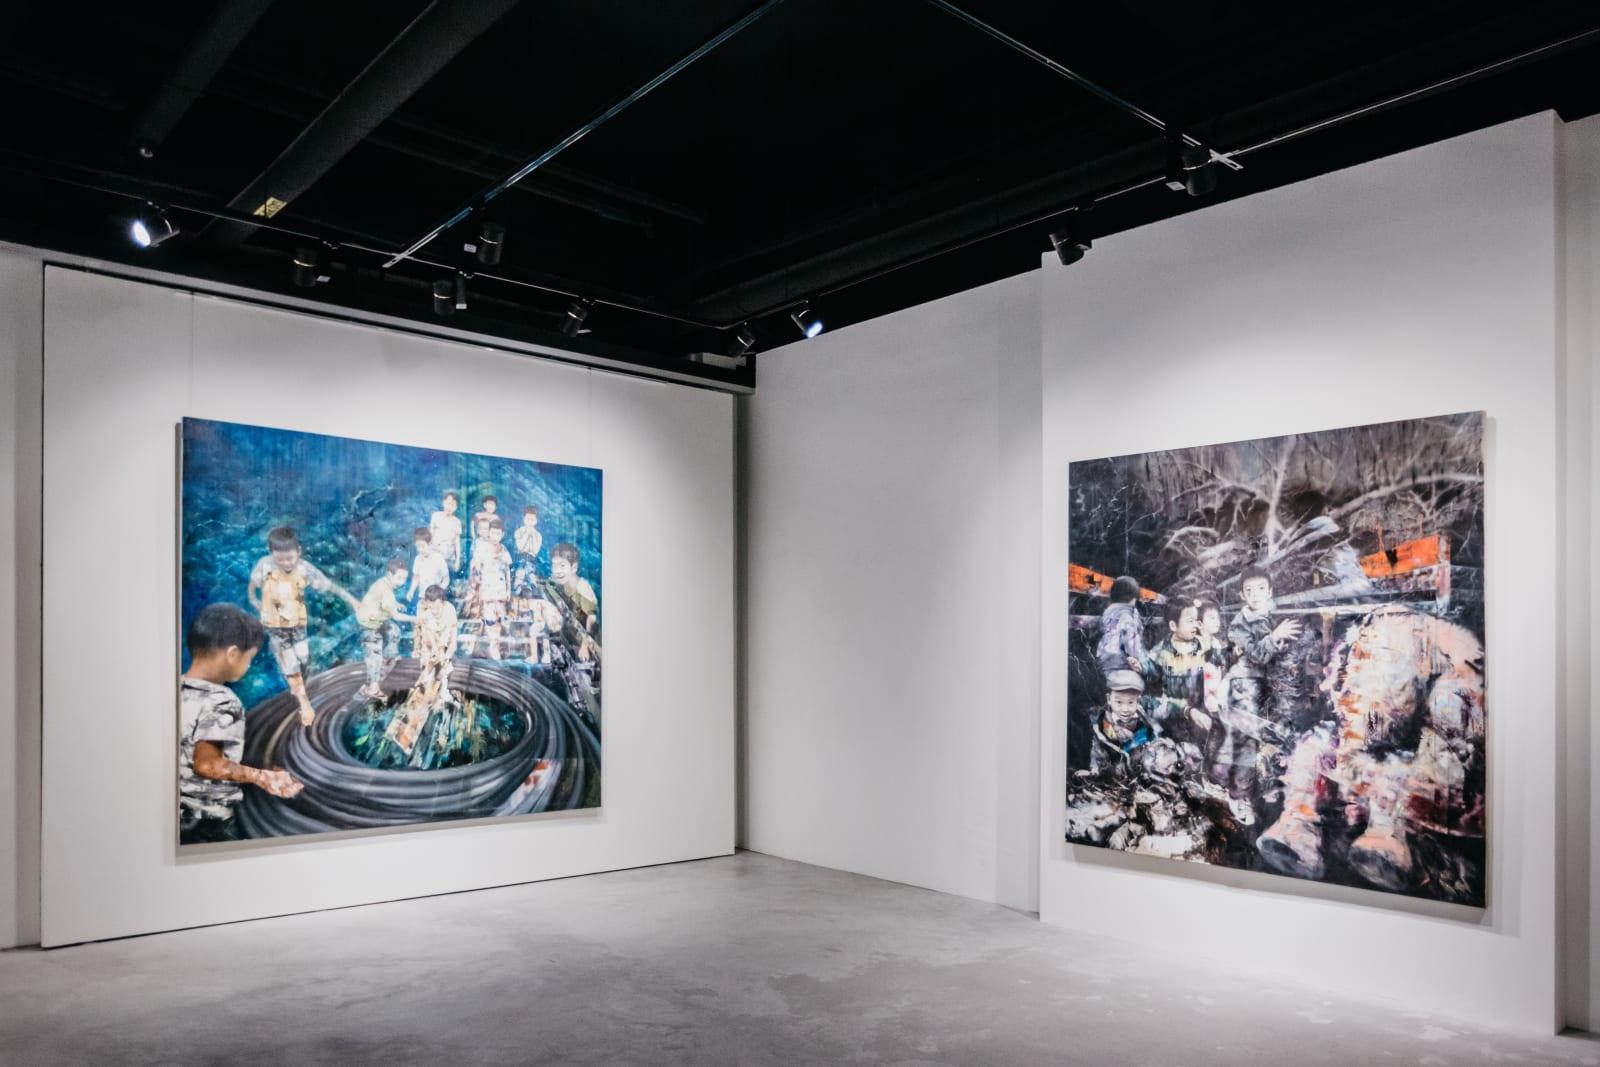 Tianbing Li: A Selection of Recent Artworks